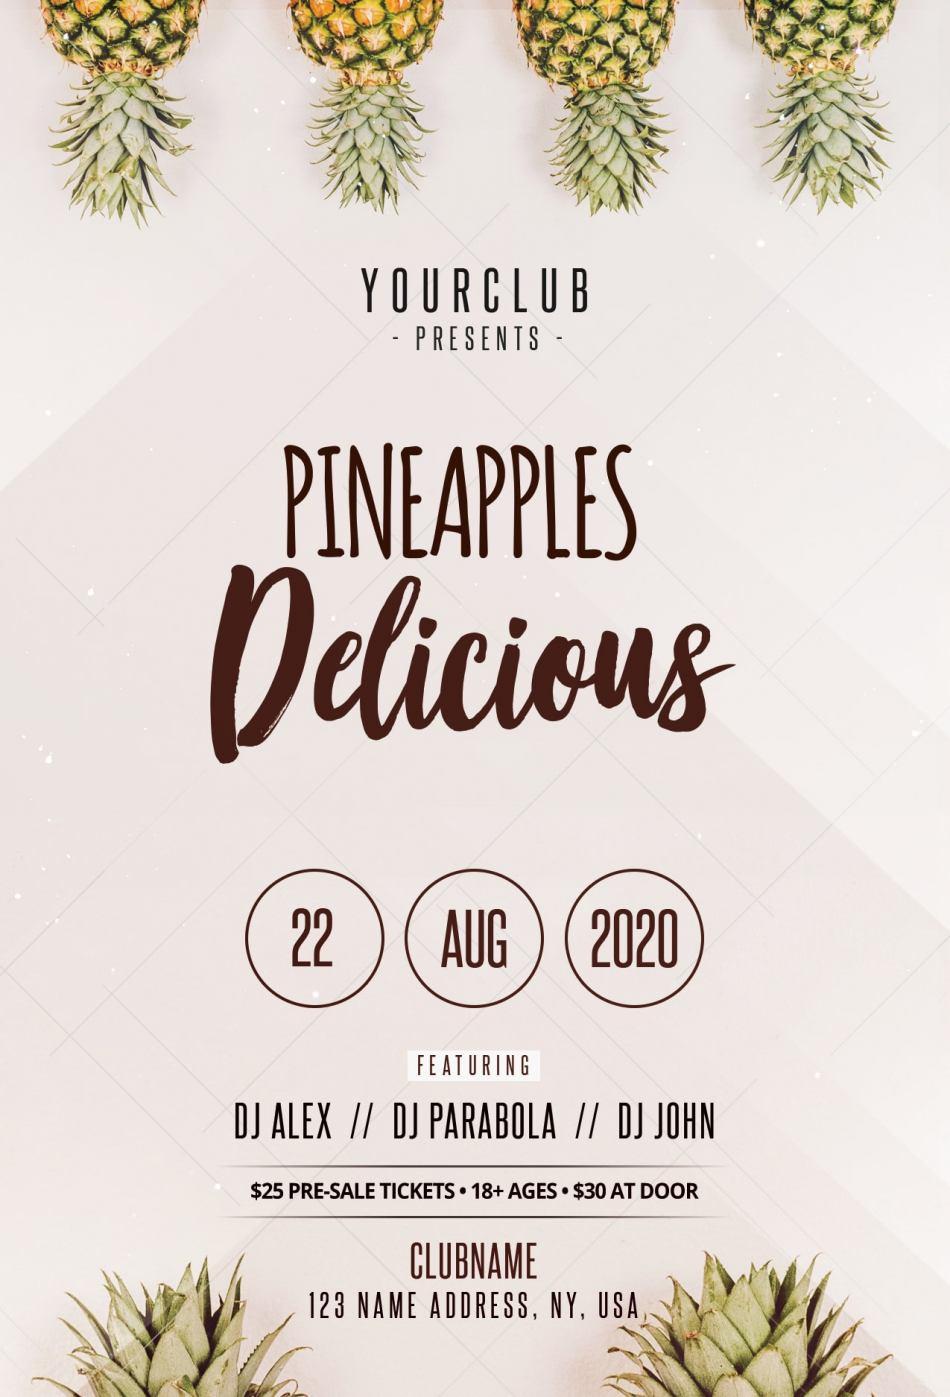 Pineapples Invitation - Minimal Free PSD Flyer Template